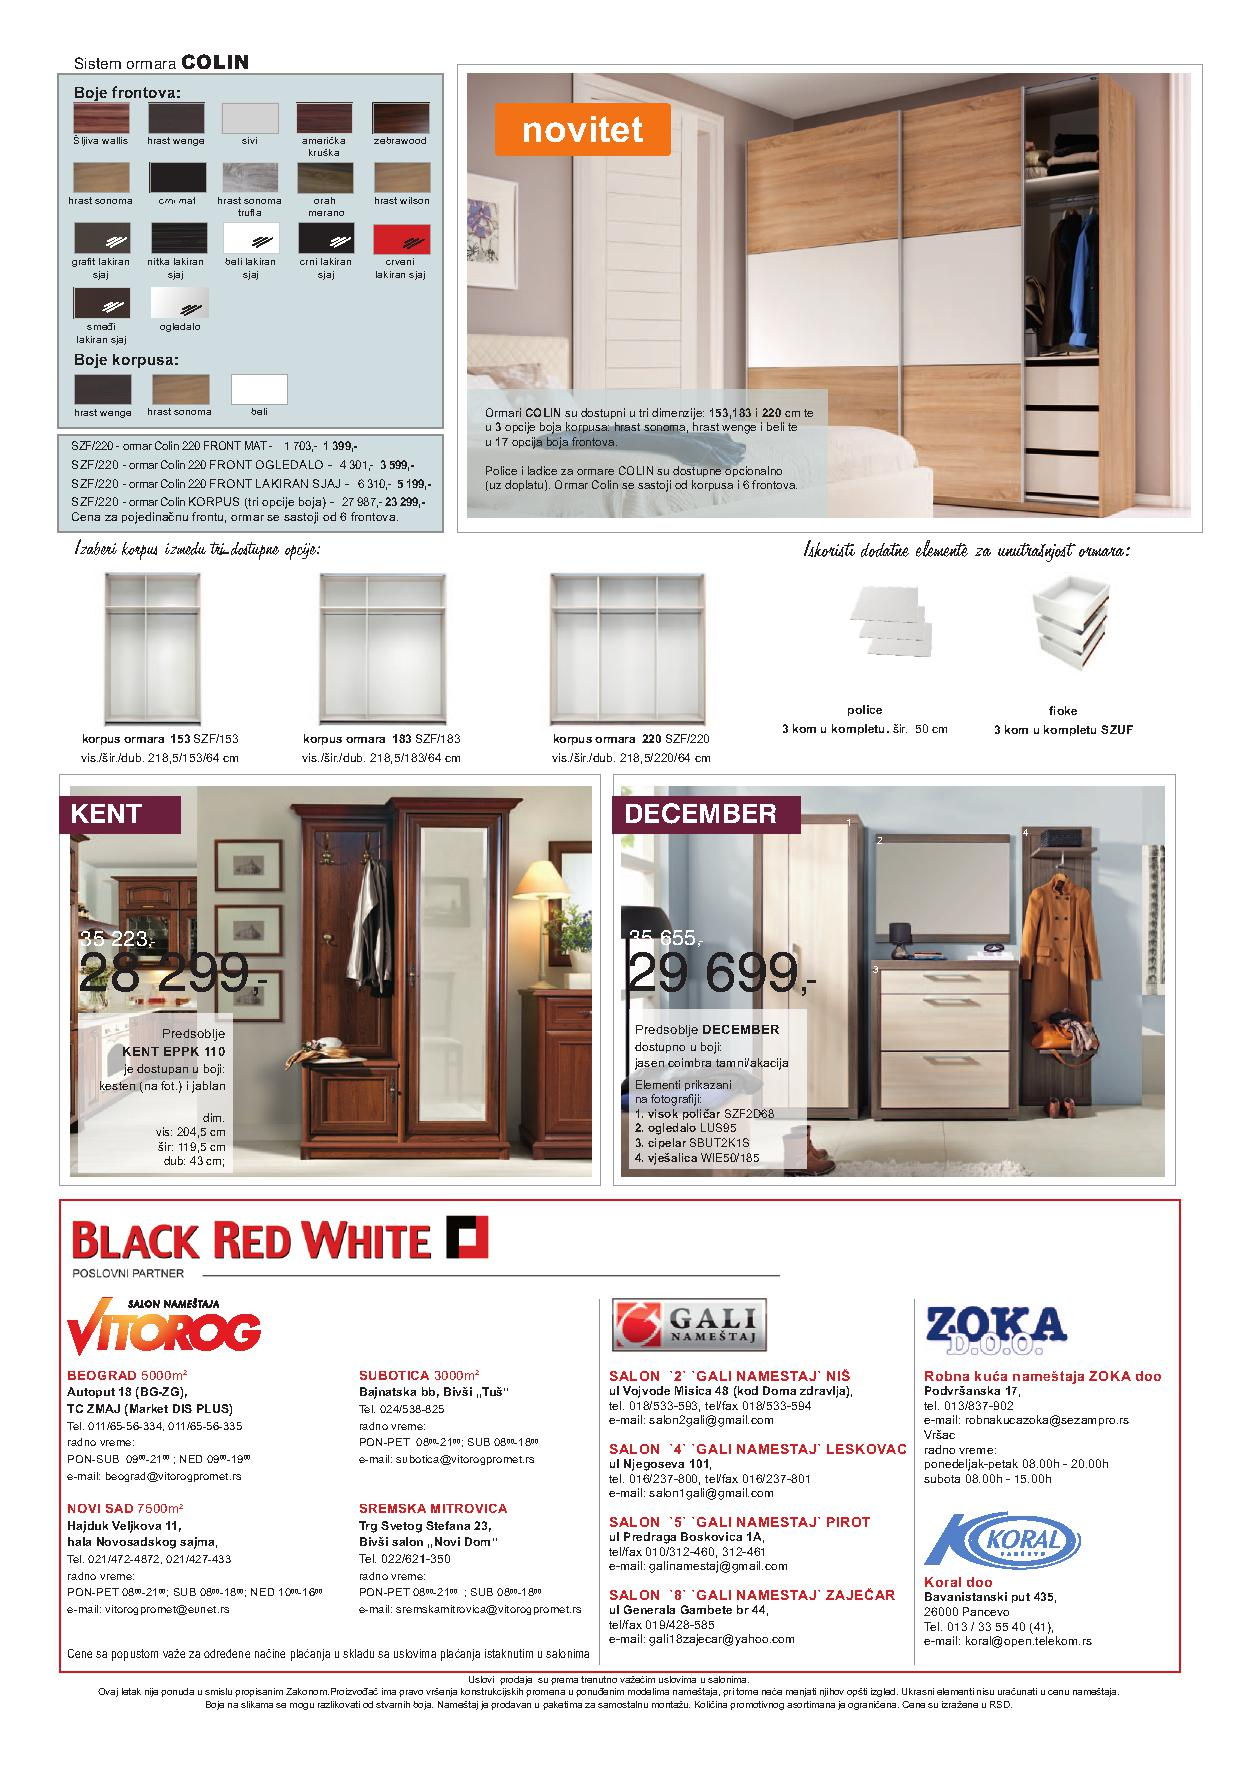 Vitorog Katalog Black Red White